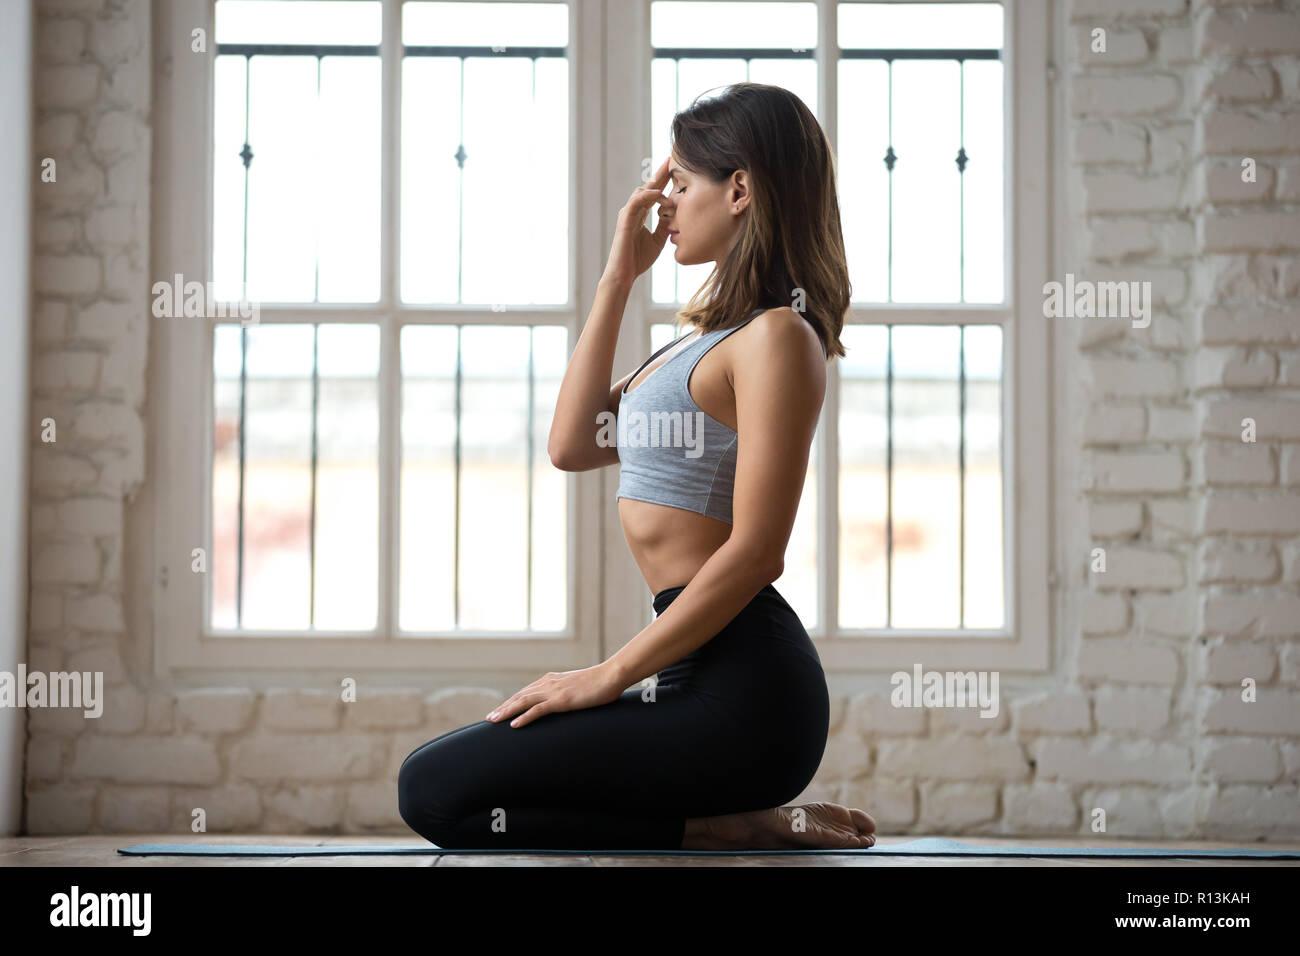 Young sporty woman practicing yoga, nadi shodhana pranayama